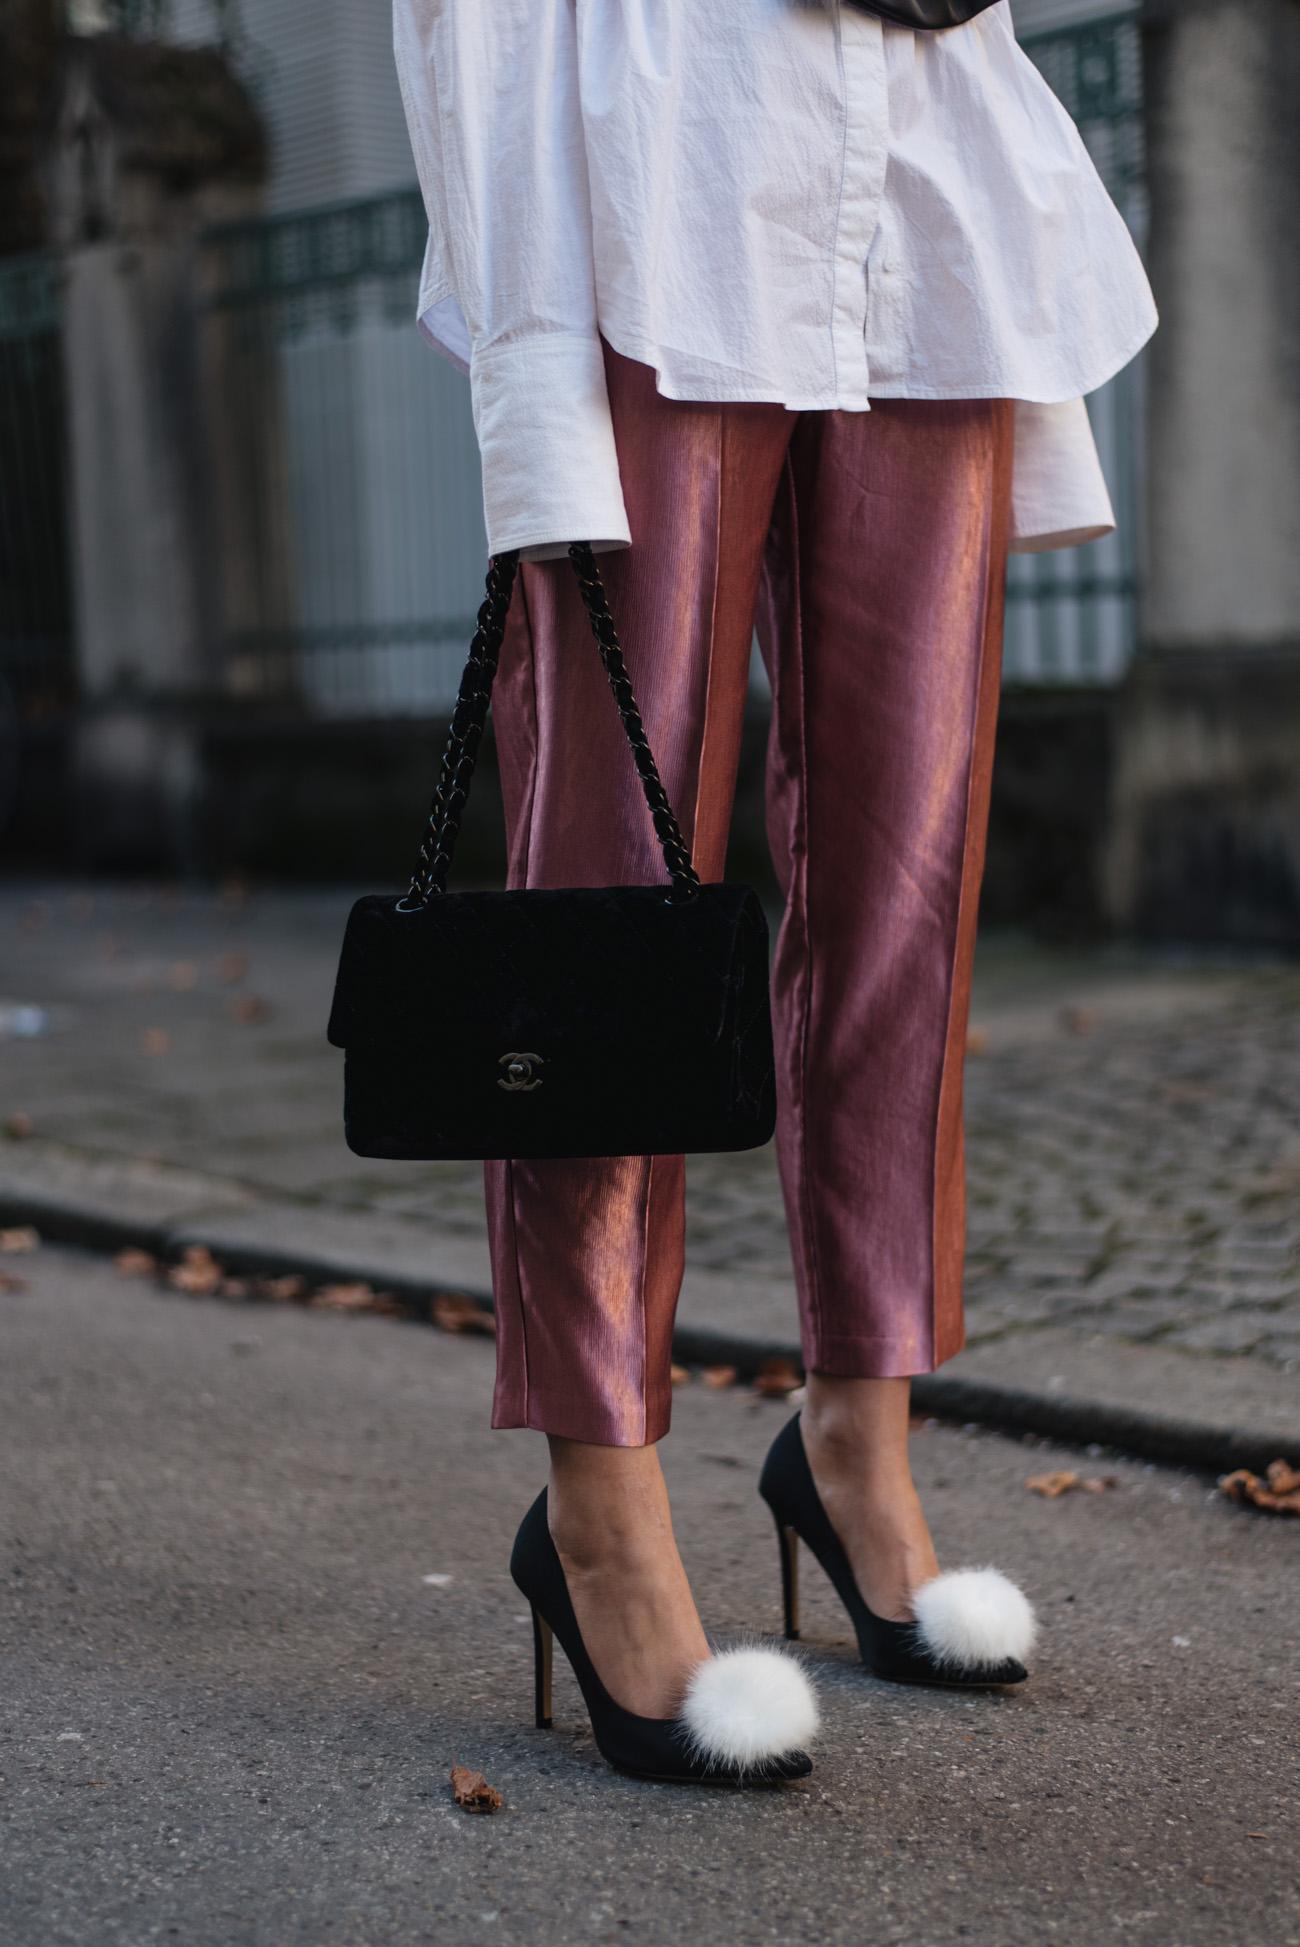 Chanel-Timeless-schwarz-samt-vintage-taschen-klassiker-velvet-bag-nina-schwichtenberg-fashiioncarpet